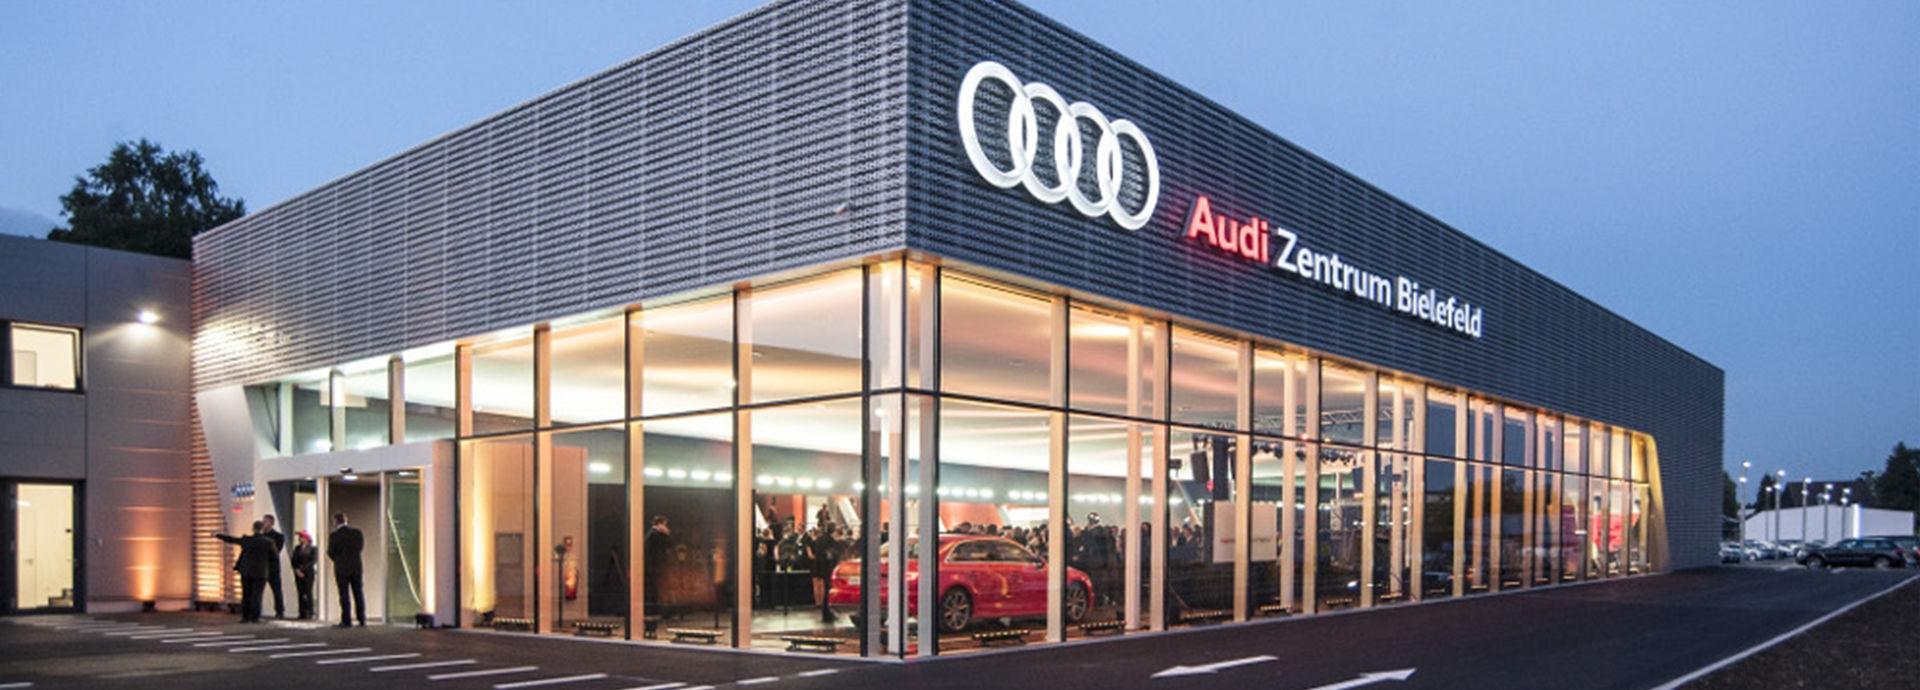 Ihr Audi Partner in Bielefeld   Auto Senger   audi car dealerships near me